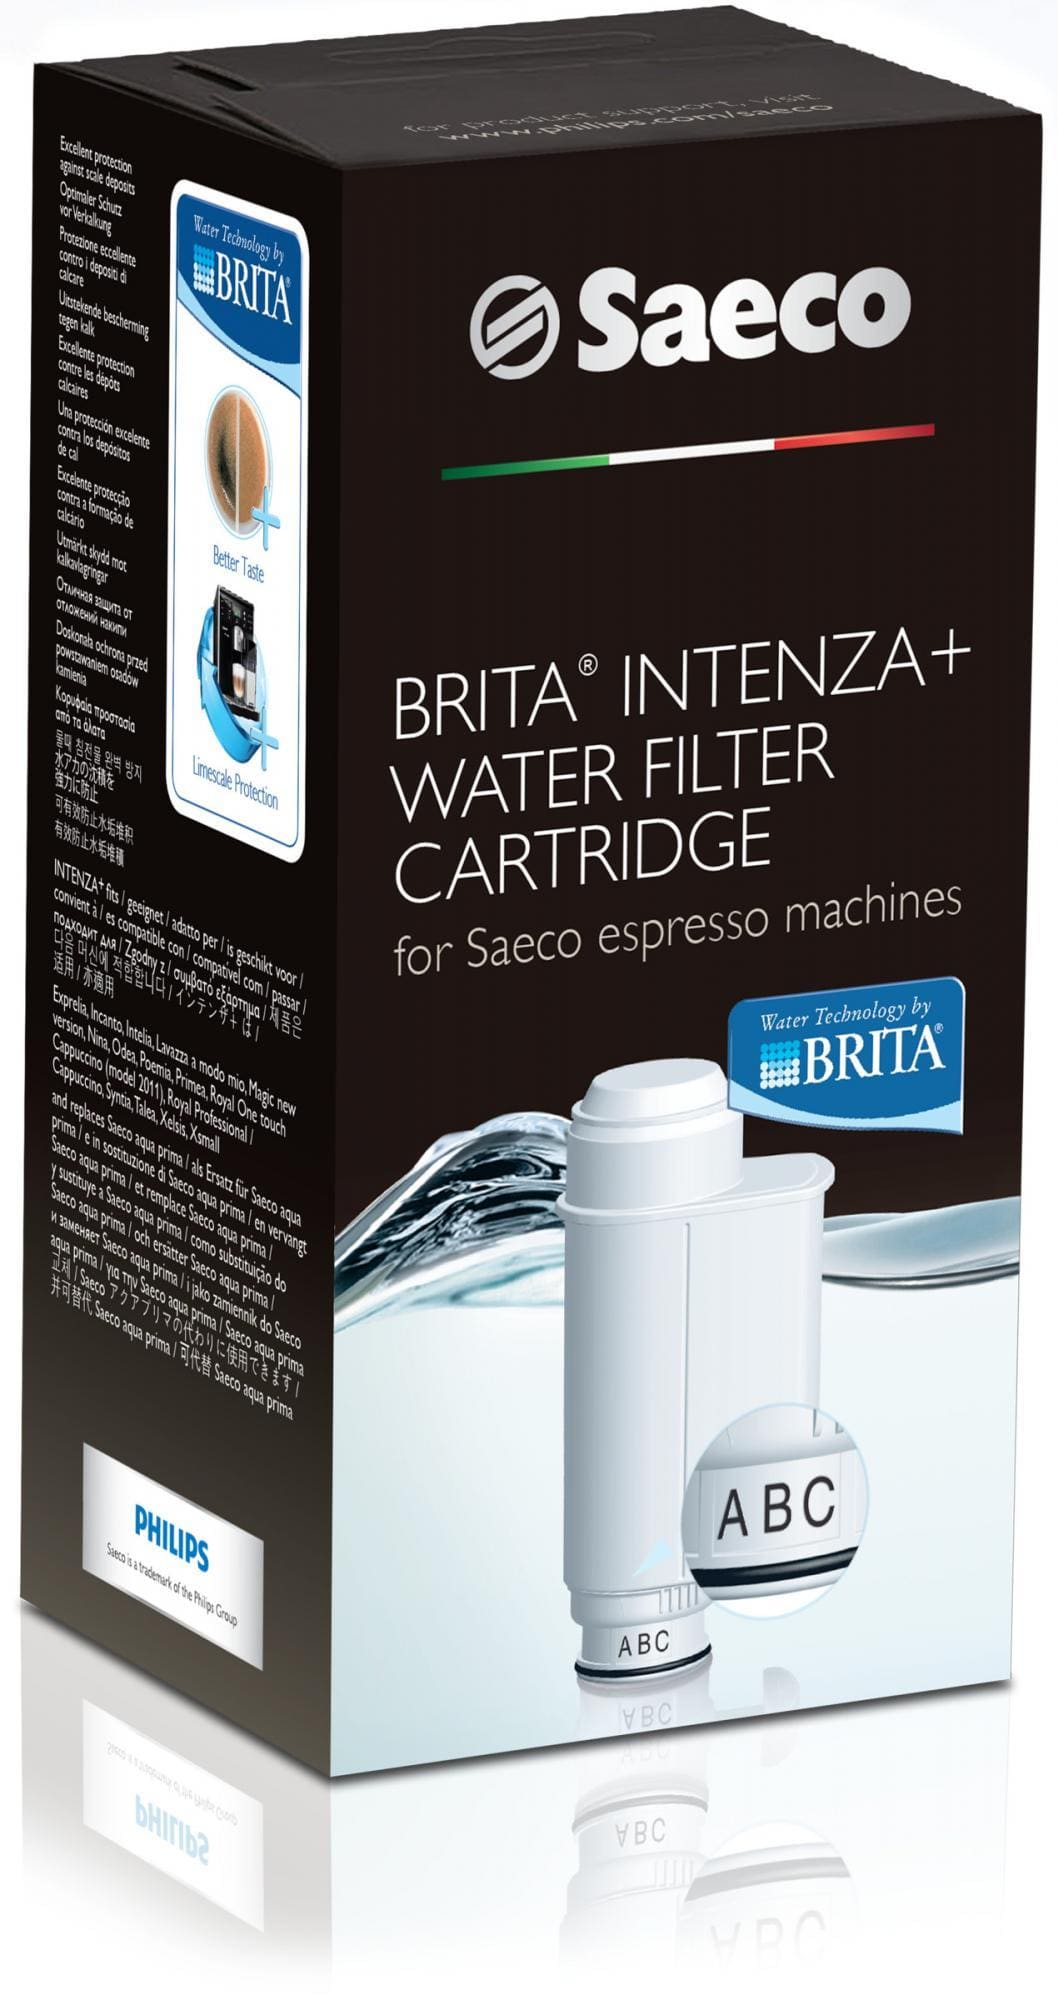 Filtr SAECO do ekspresów Saeco/Philips - INTENZA BRITA CA6702/10